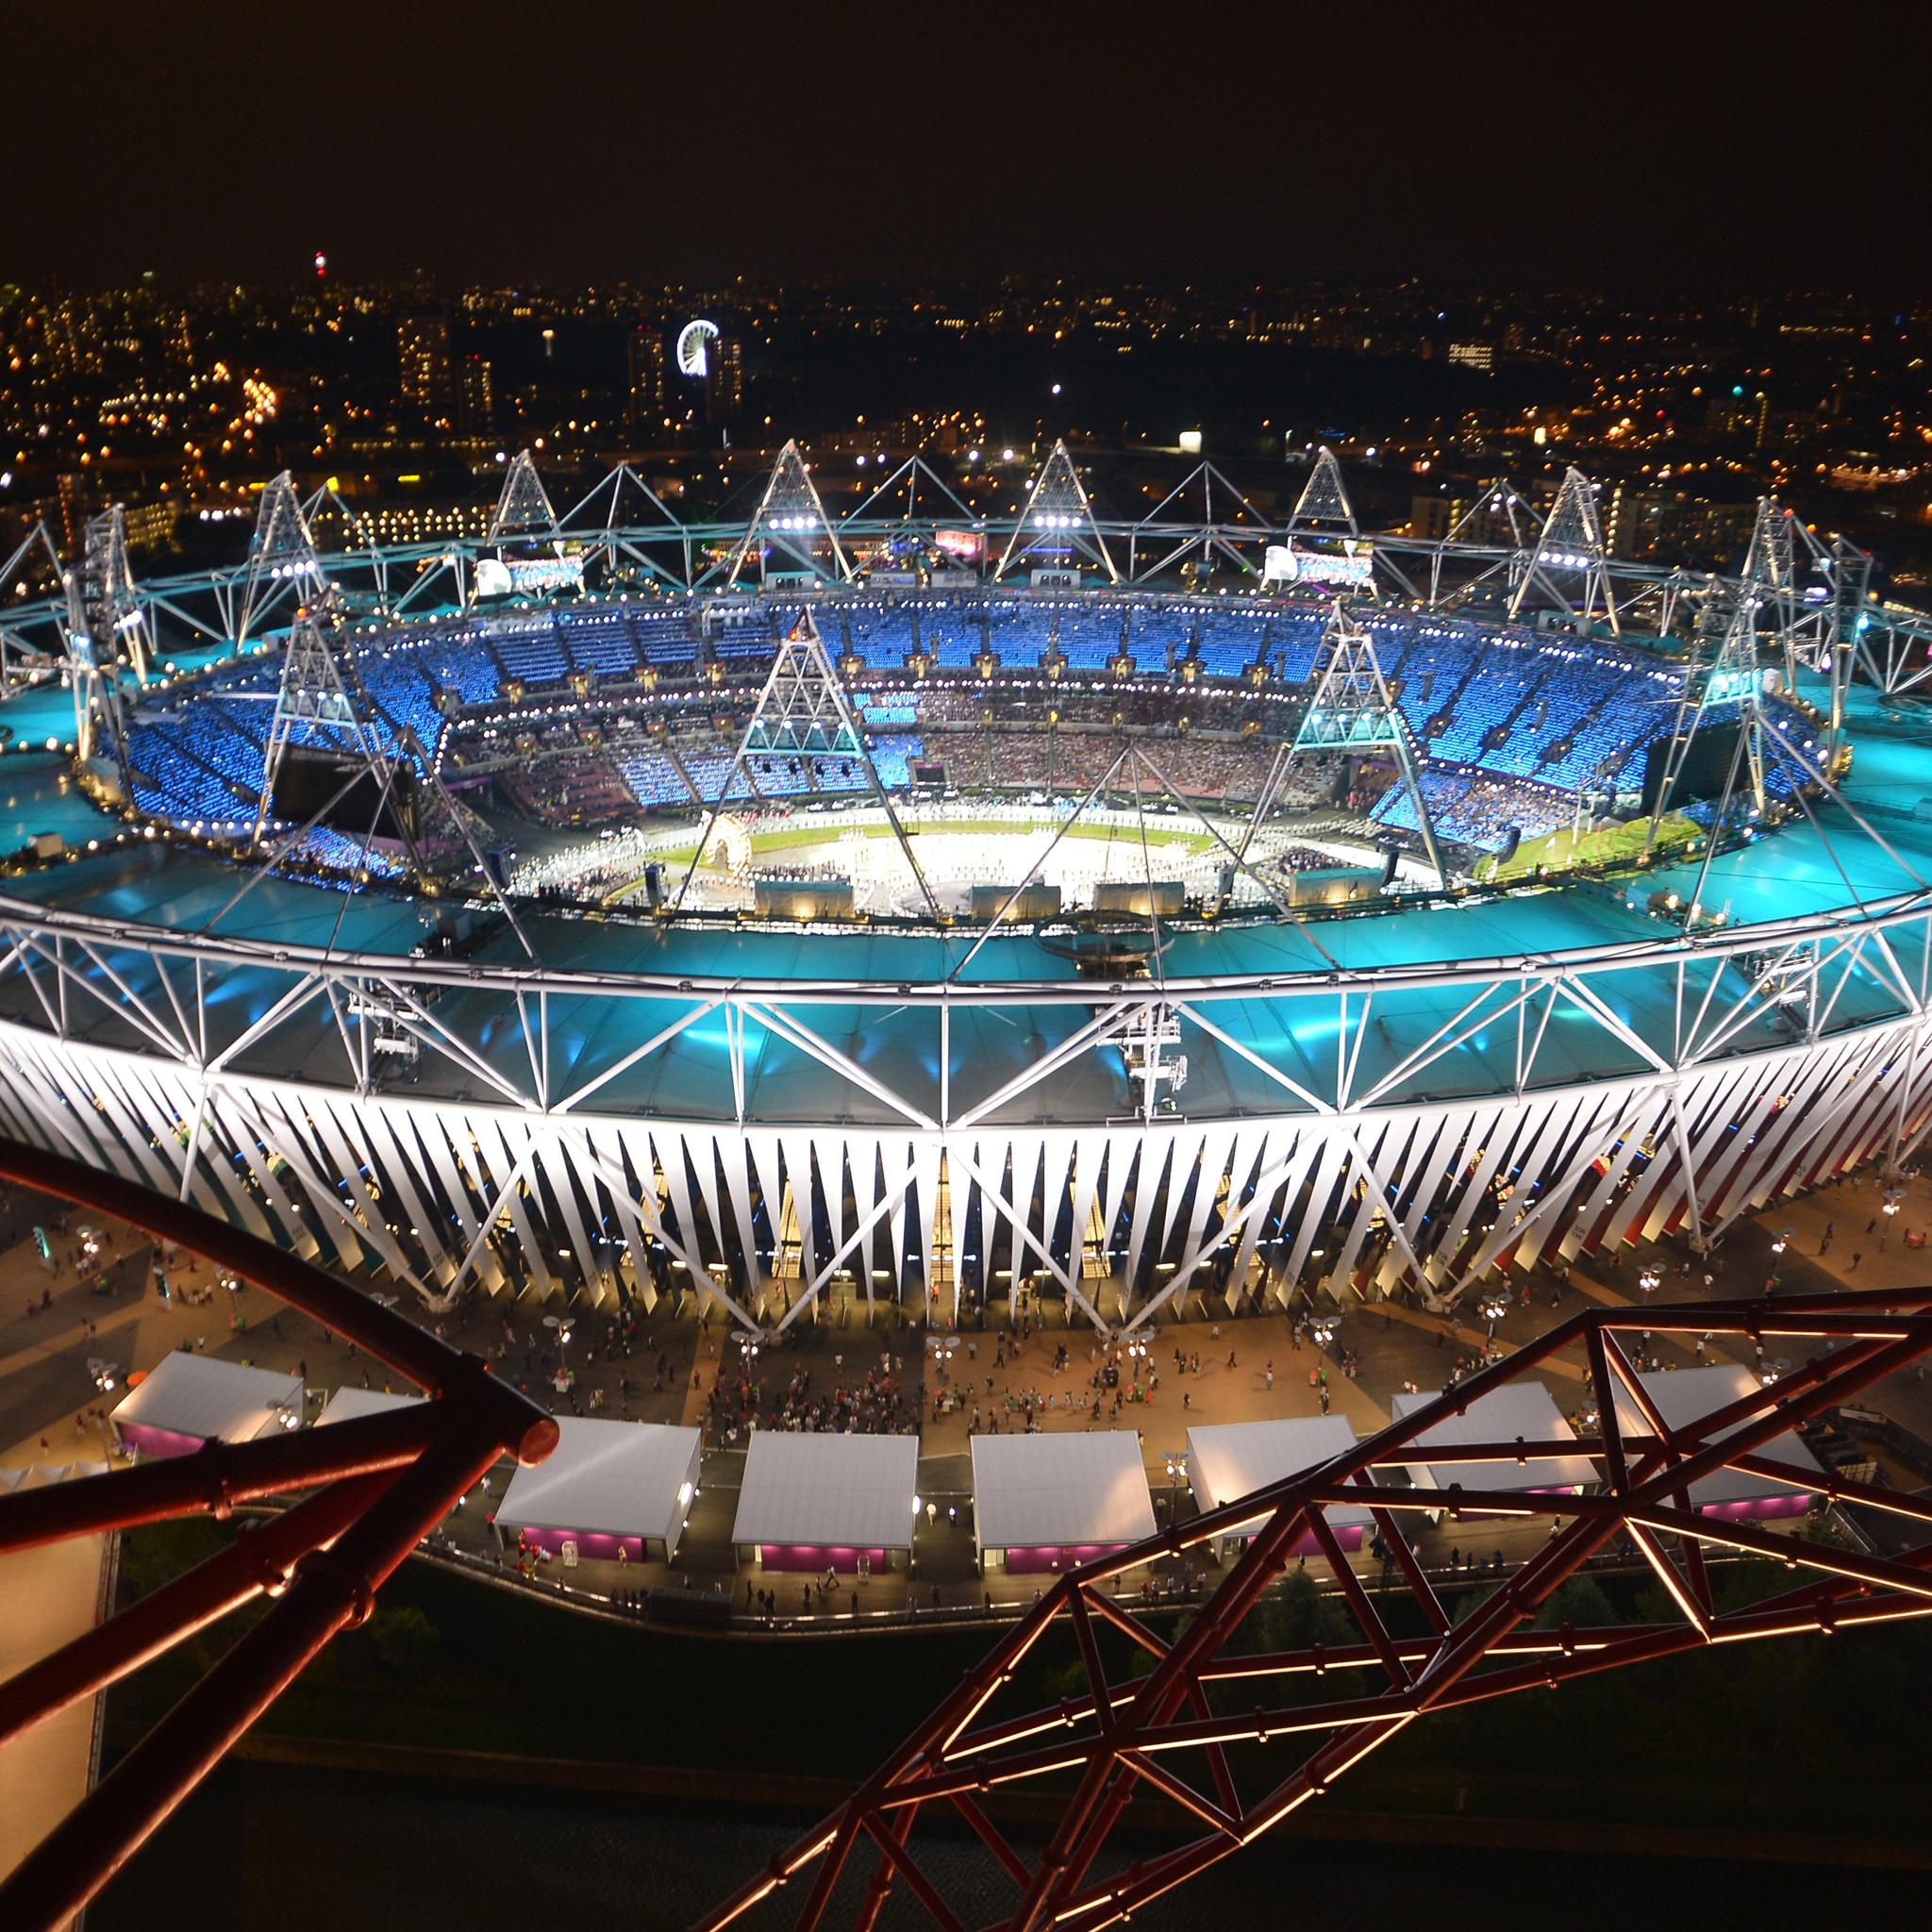 Stade-Olympique-2012-3Wallpapers-iPad-Retina